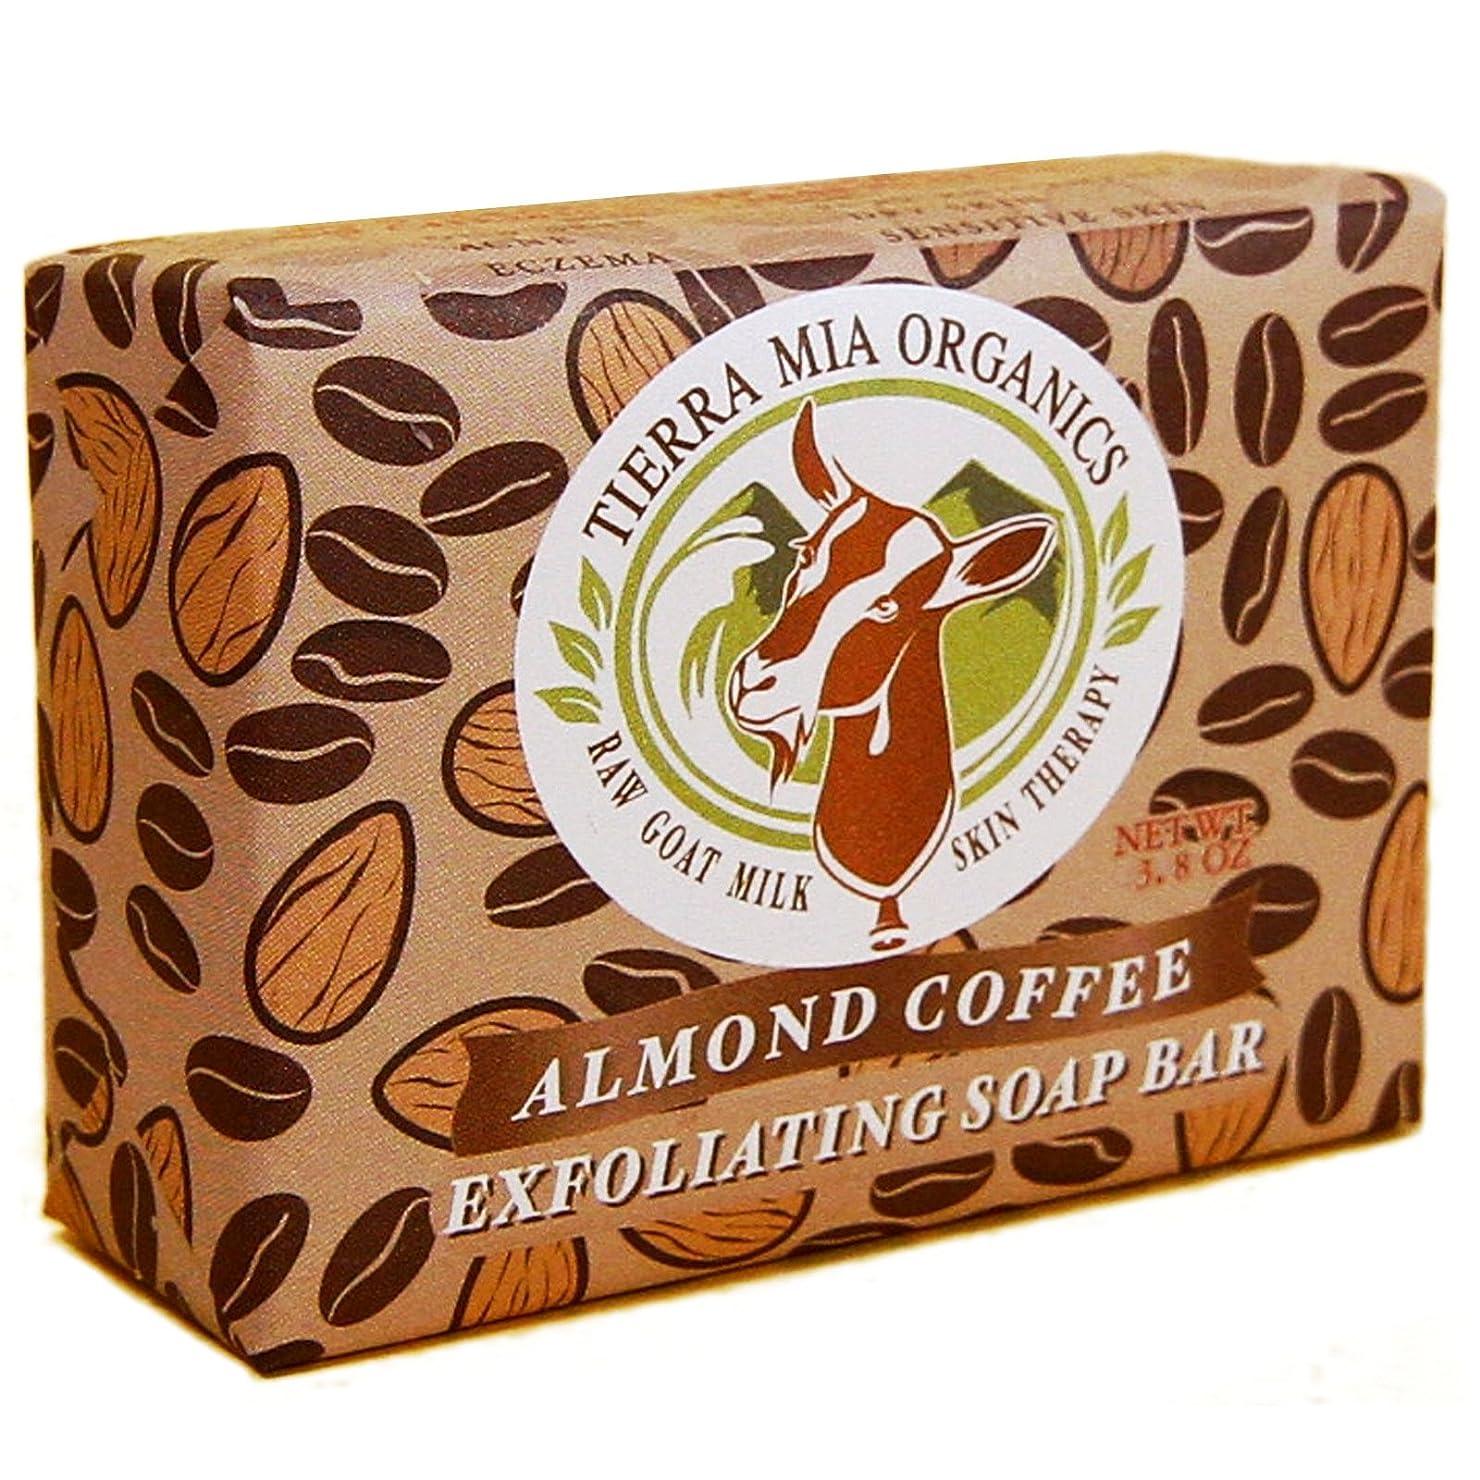 者動機仮定Tierra Mia Organics, Raw Goat Milk Skin Therapy, Exfoliating Soap Bar, Almond Coffee, 3.8 oz